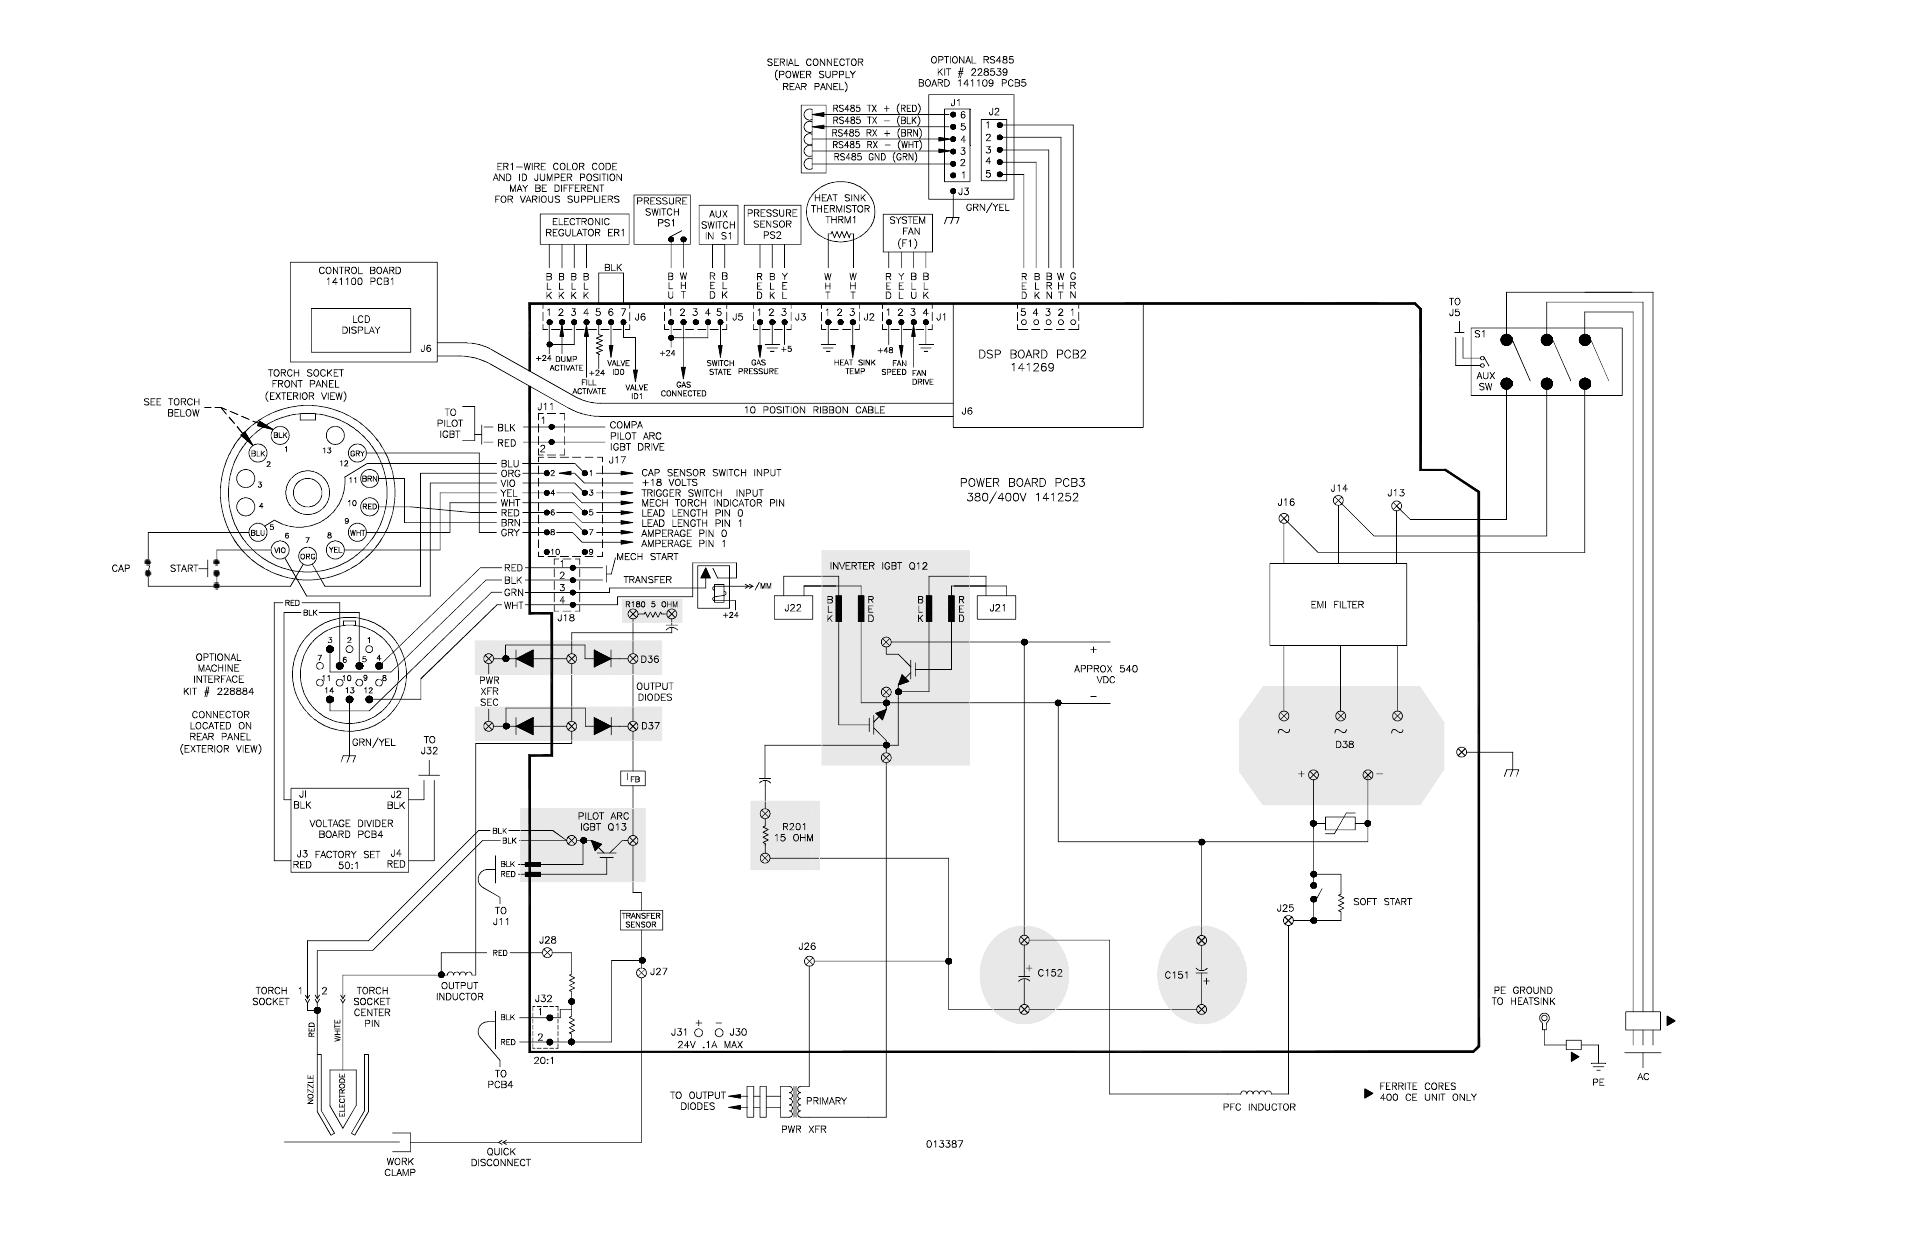 Schematic Diagram 380 V Ccc 400 V Ce Schematic Diagram